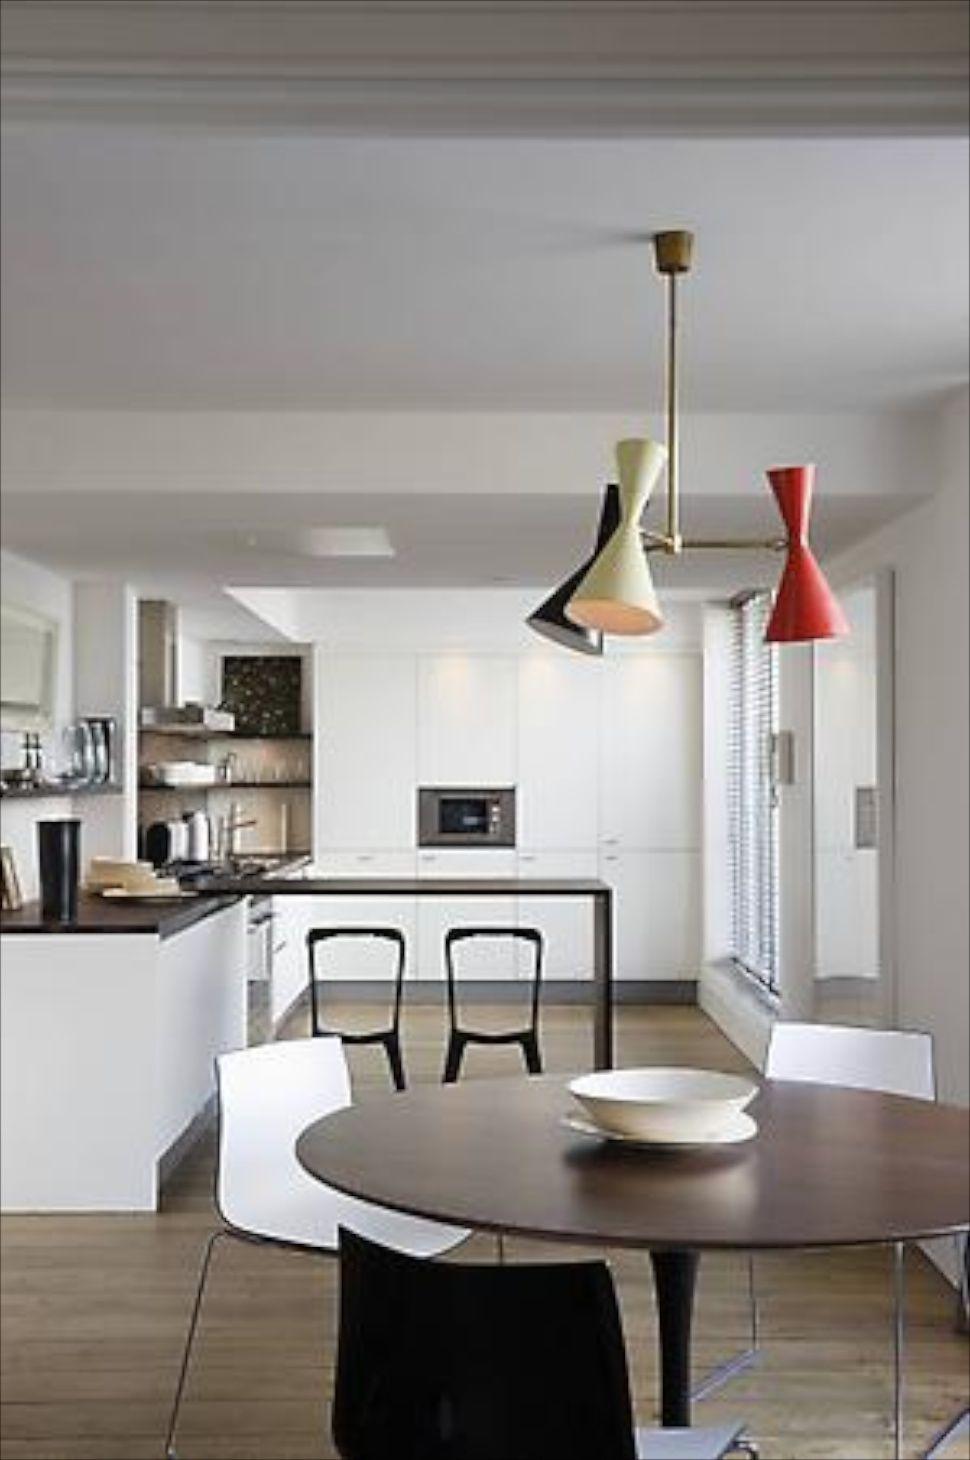 Rose Uniacke Interiors, London Beautiful kitchens